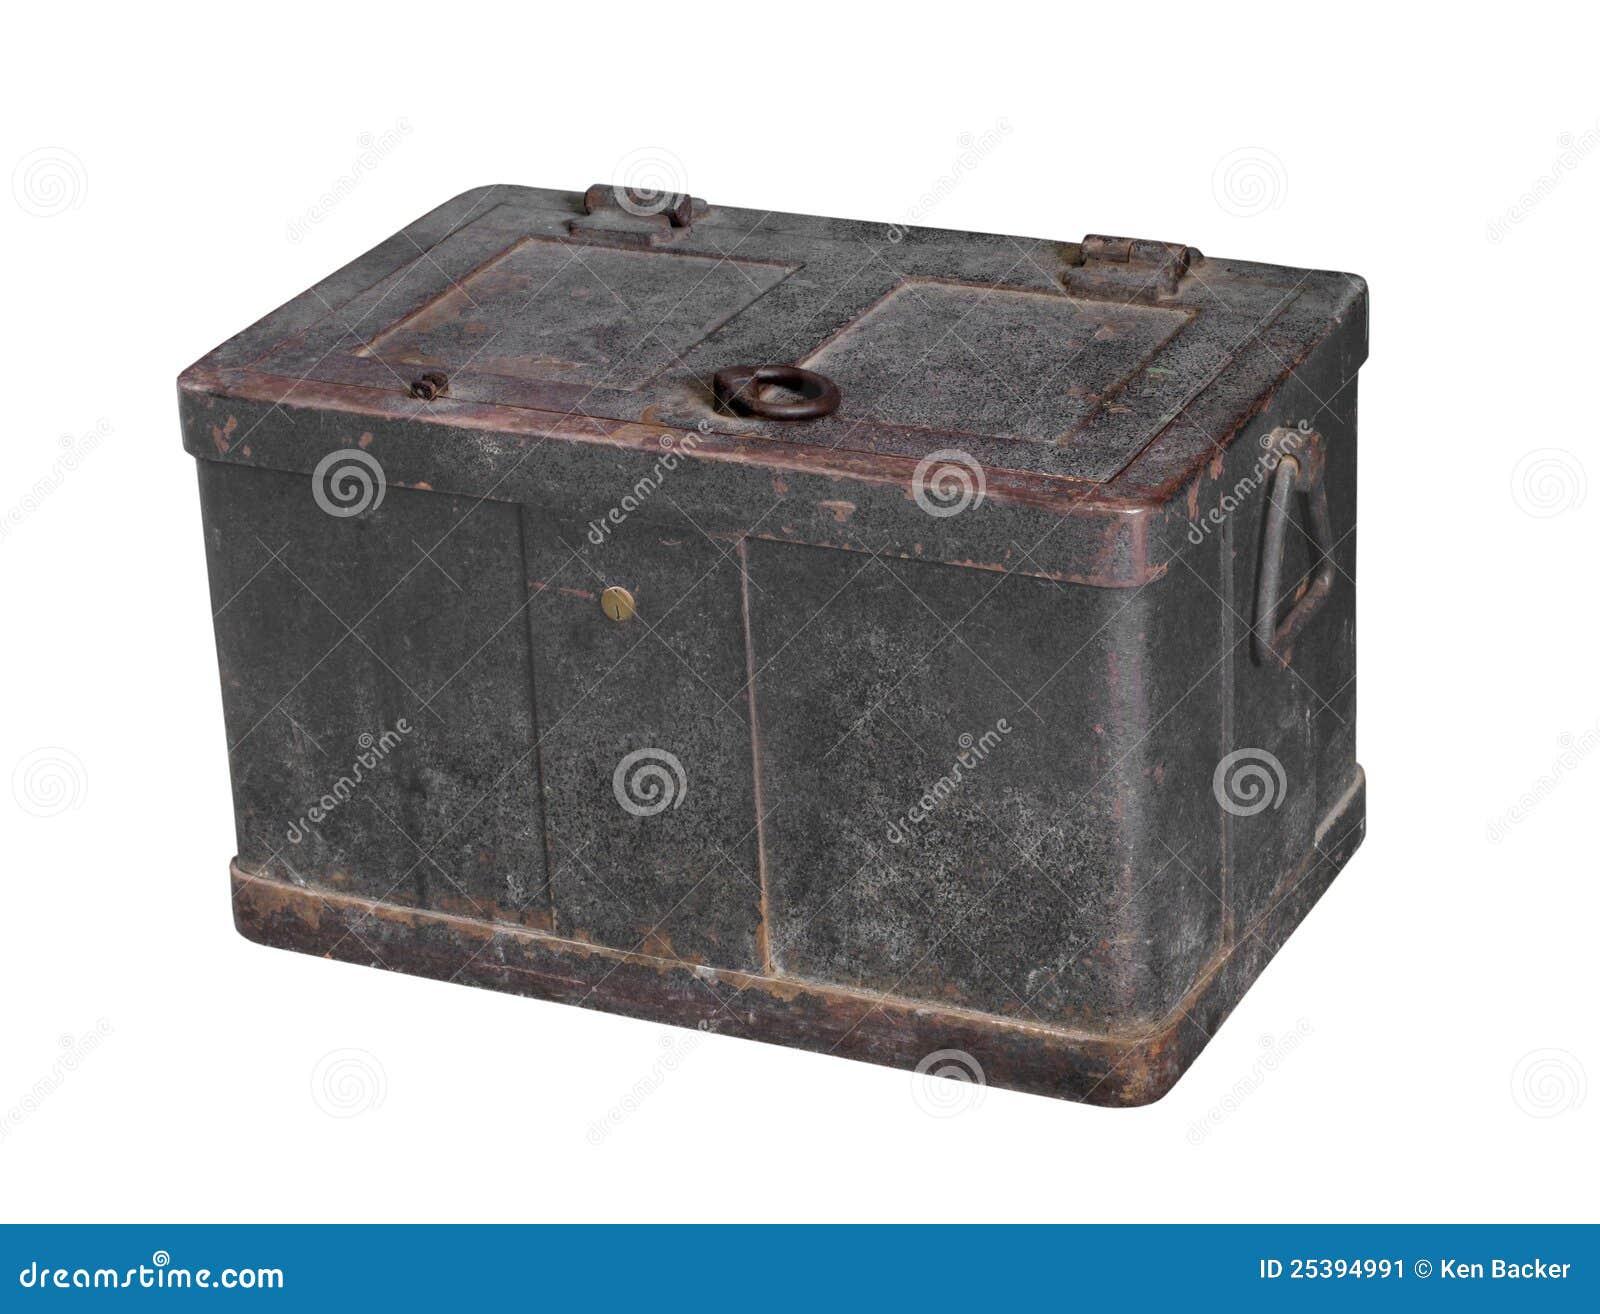 Caja fuerte de metales pesados vieja aislada.